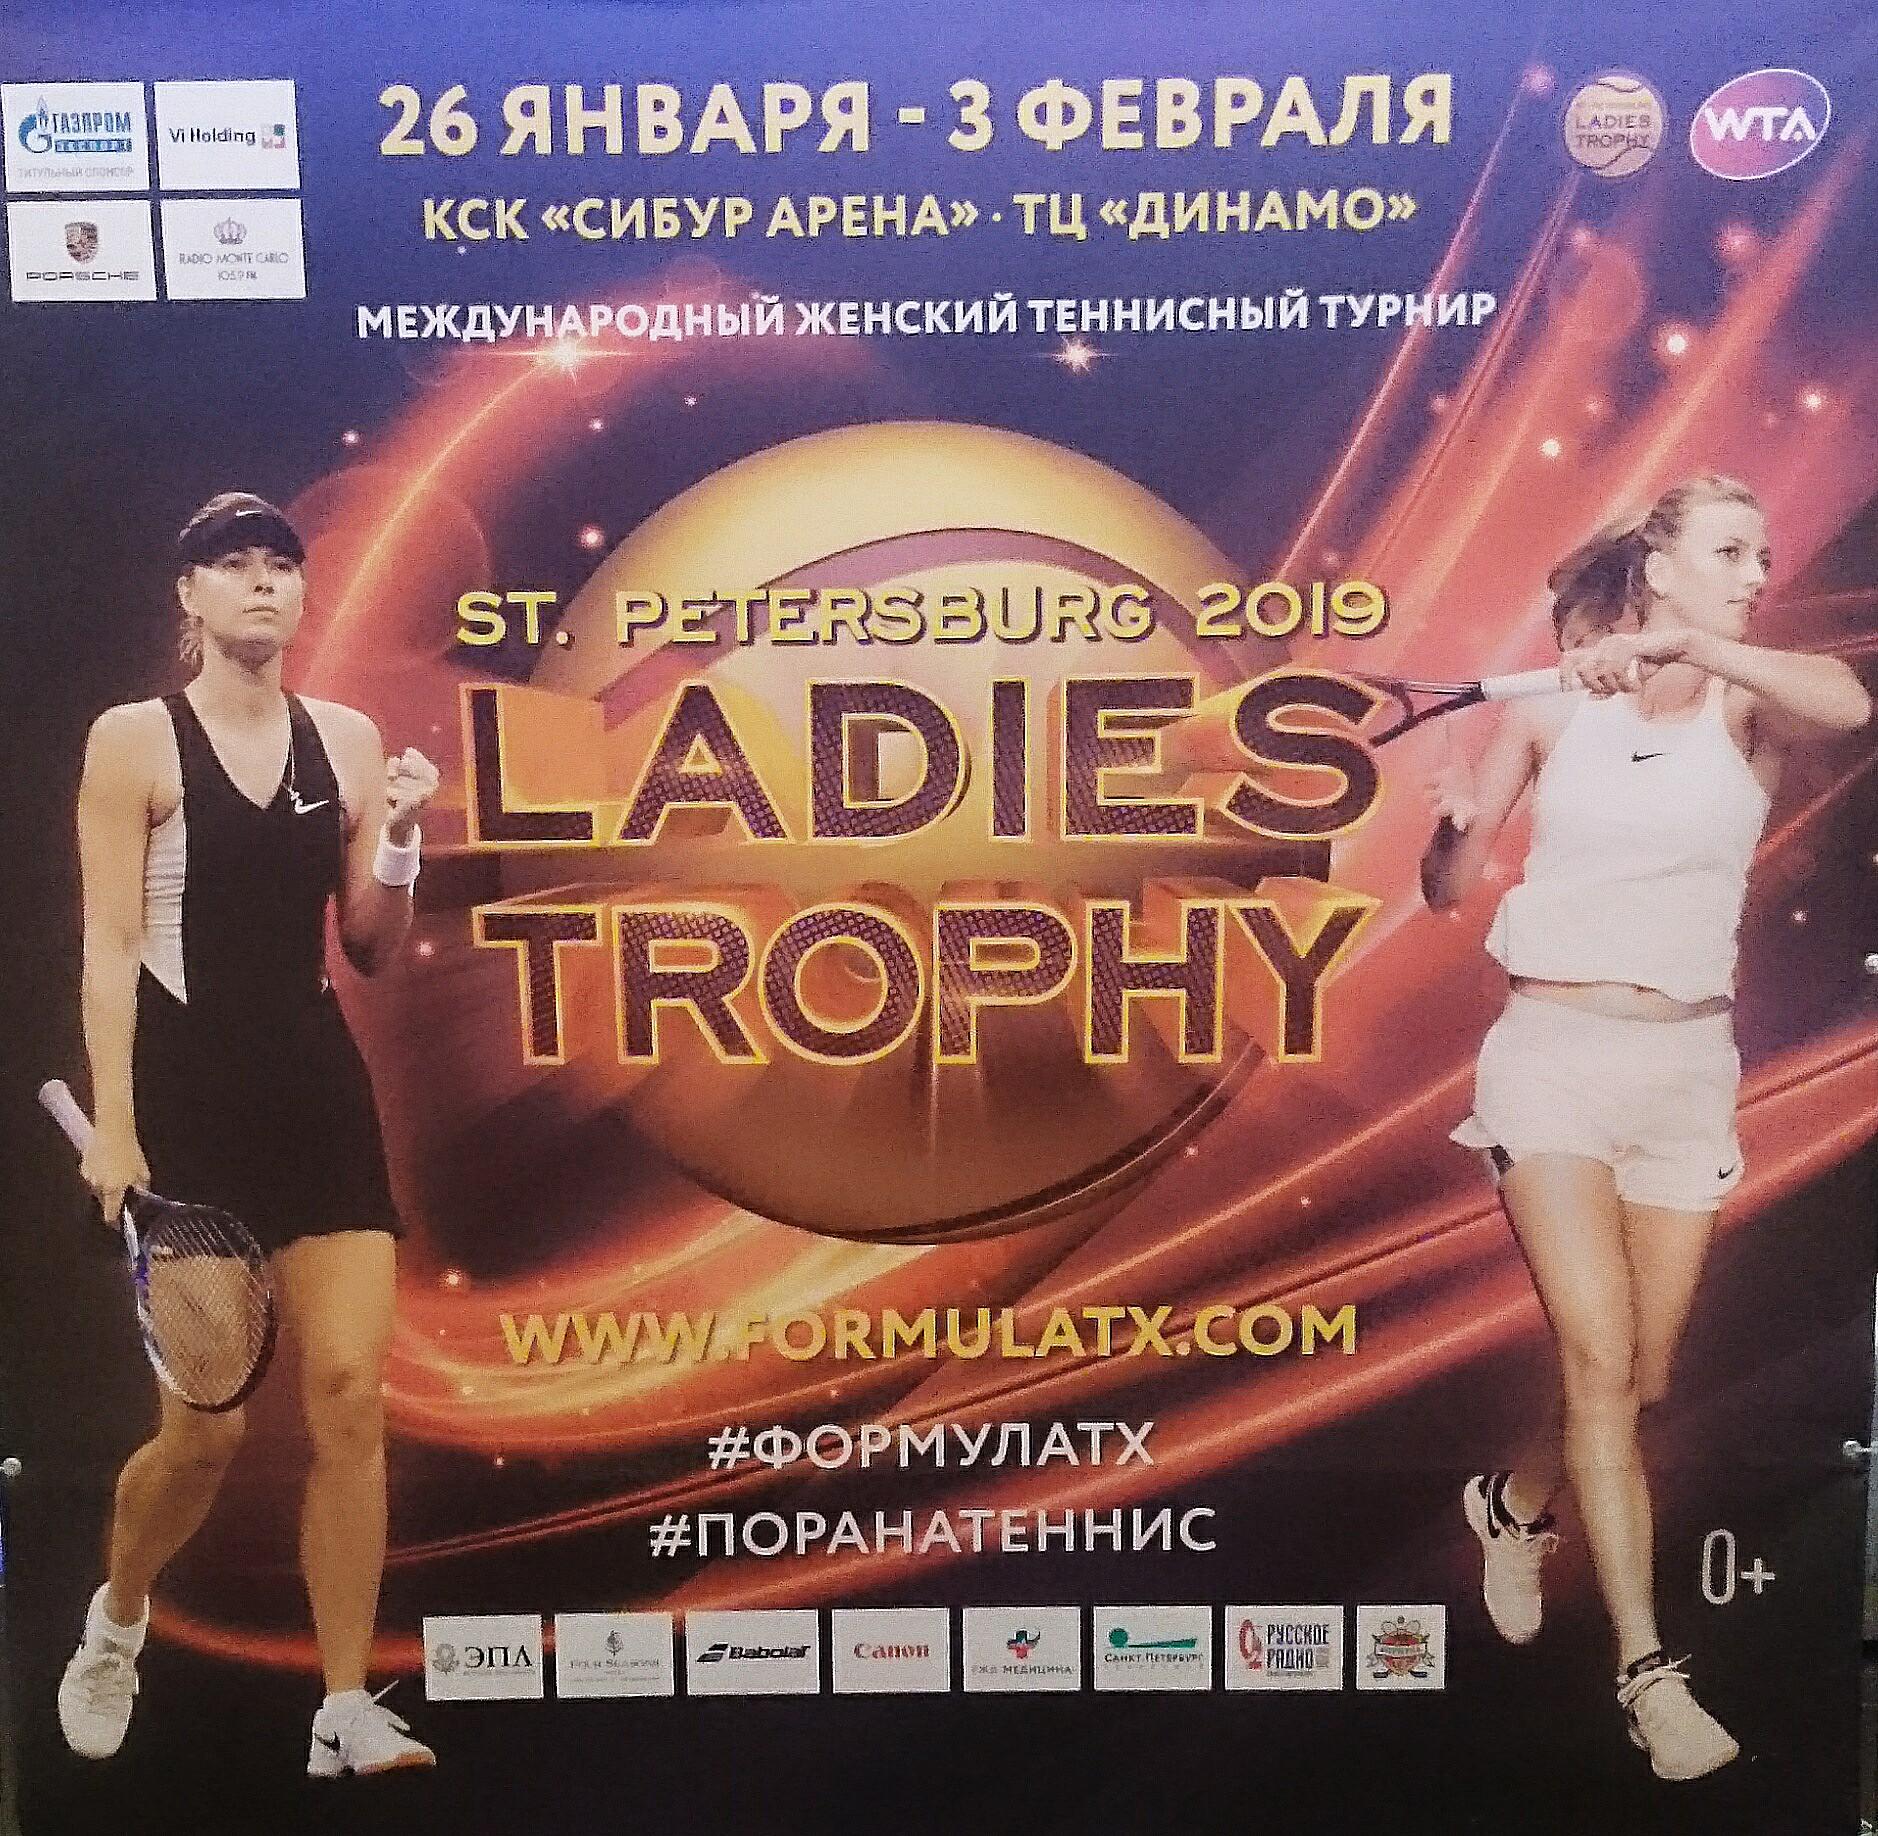 Мармеладки от Марии Шараповой едут в Санкт-Петербург